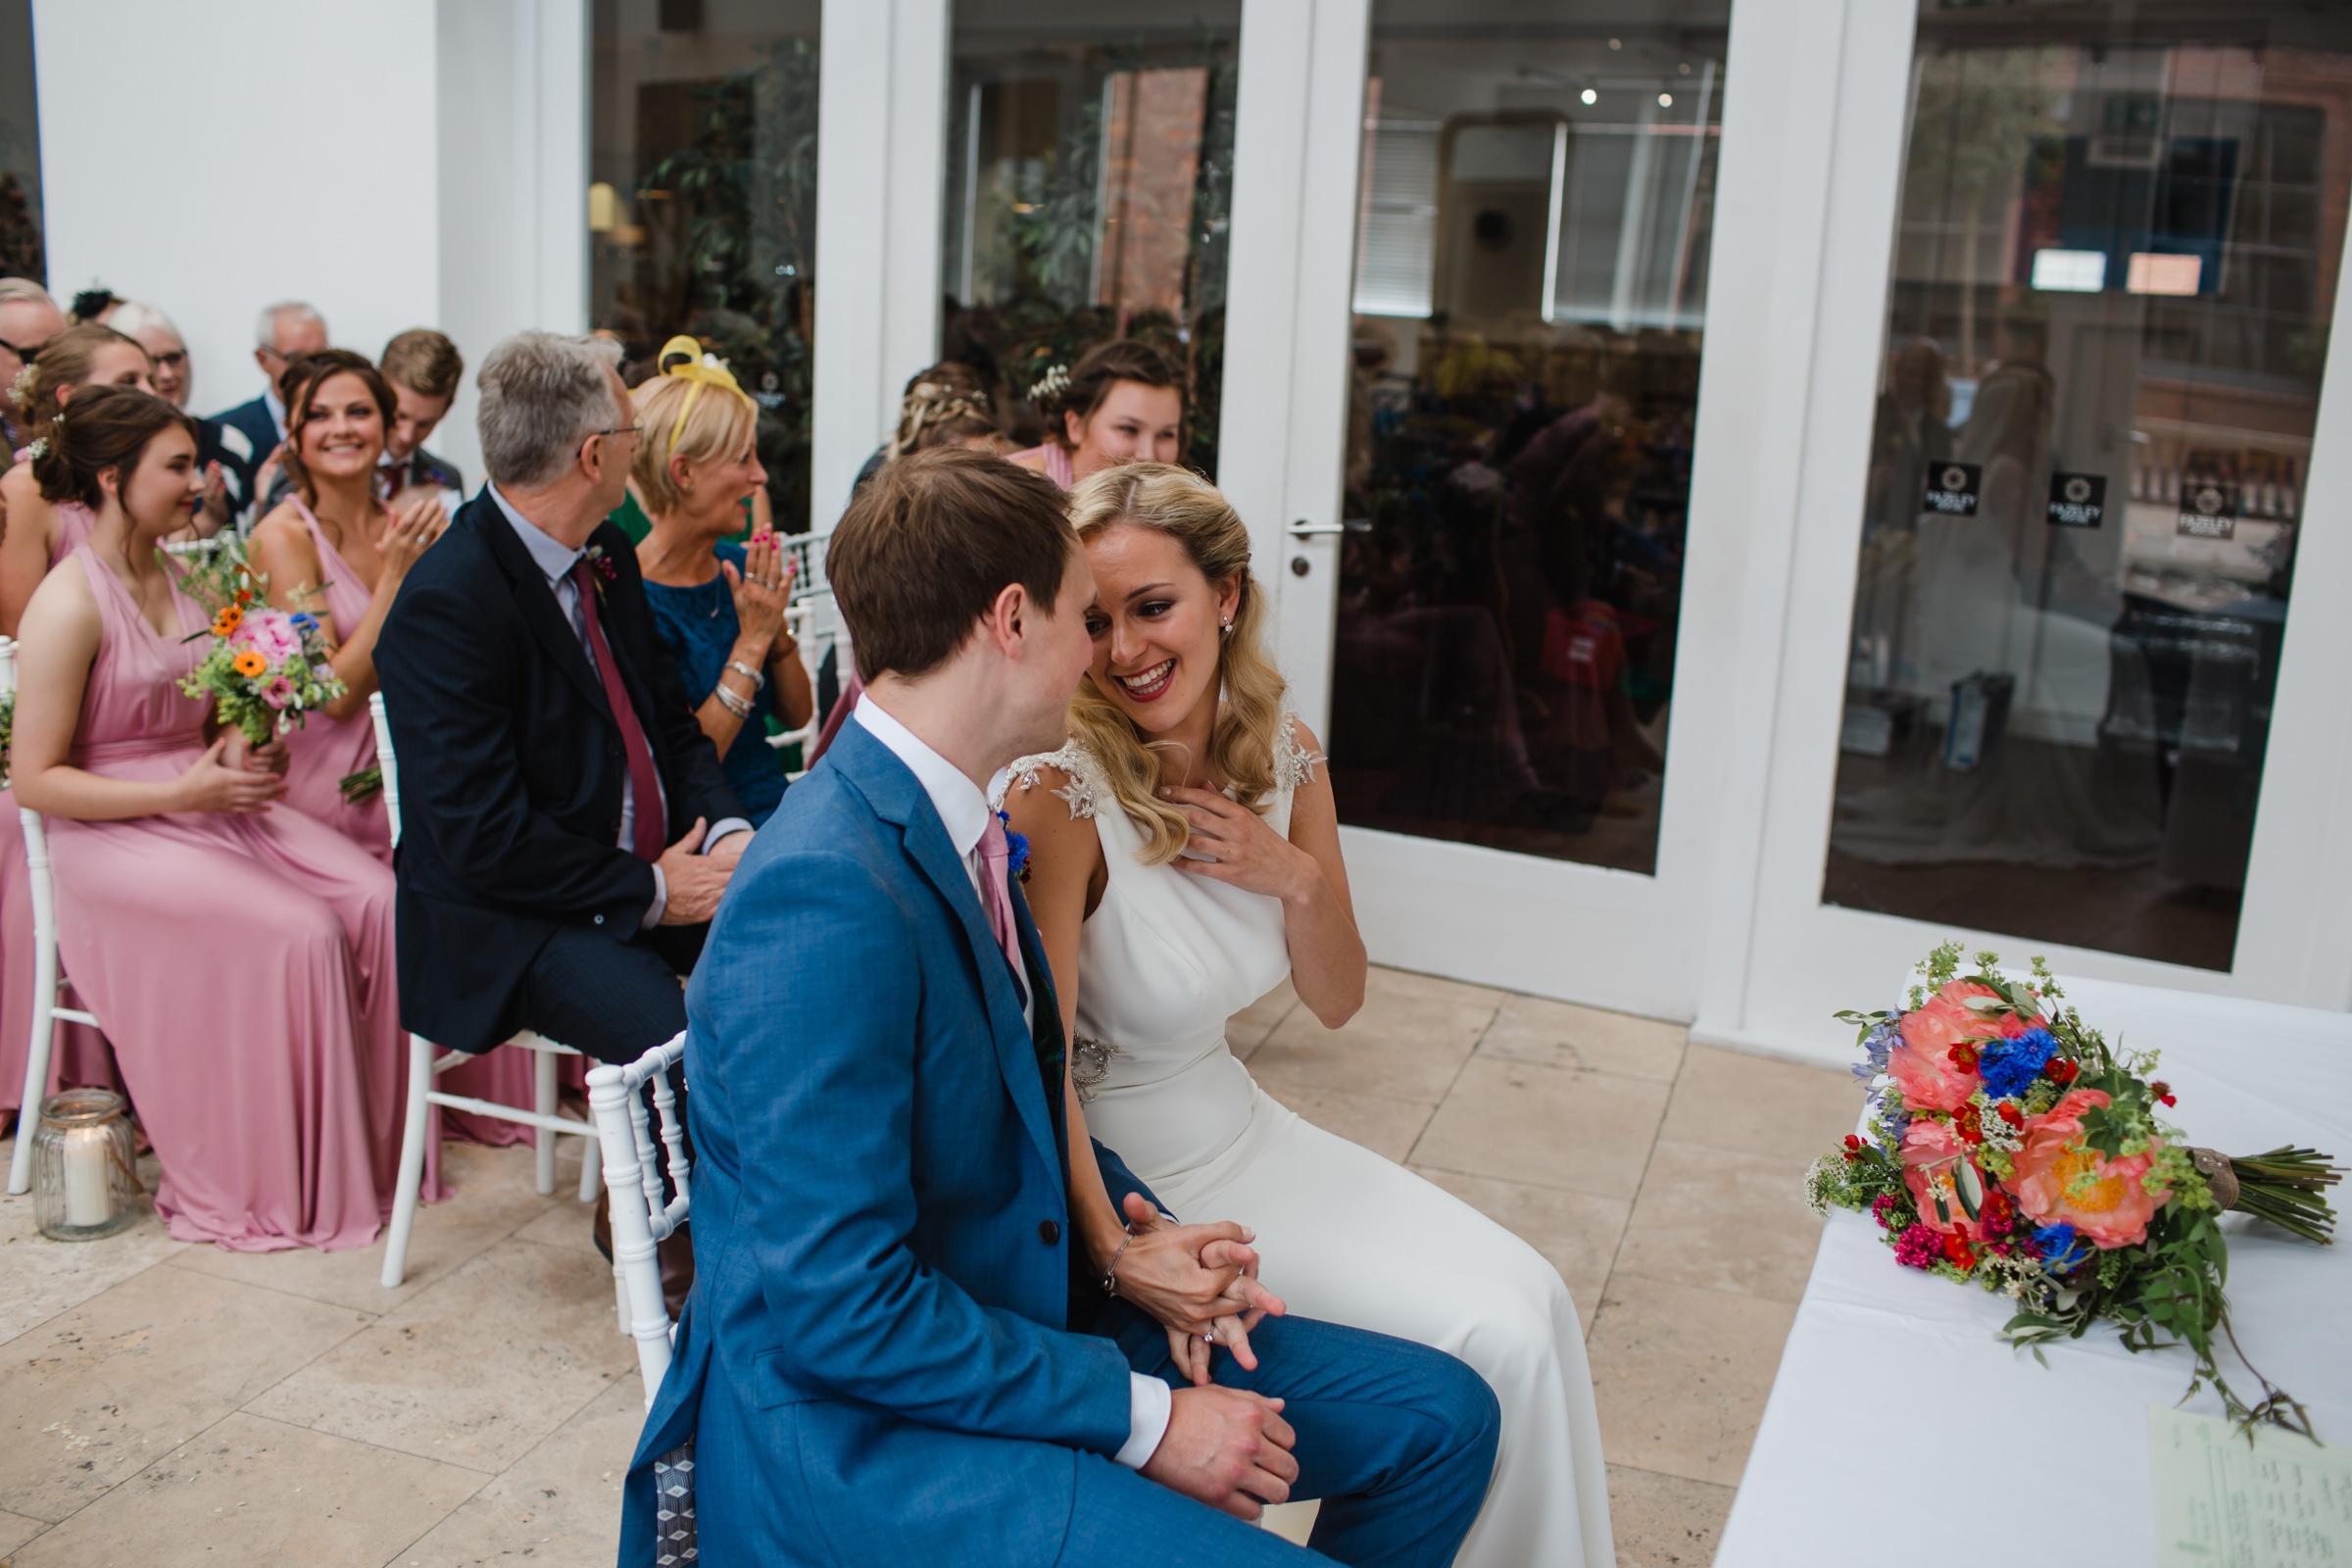 a quiet moment during a wedding at fazeley studios